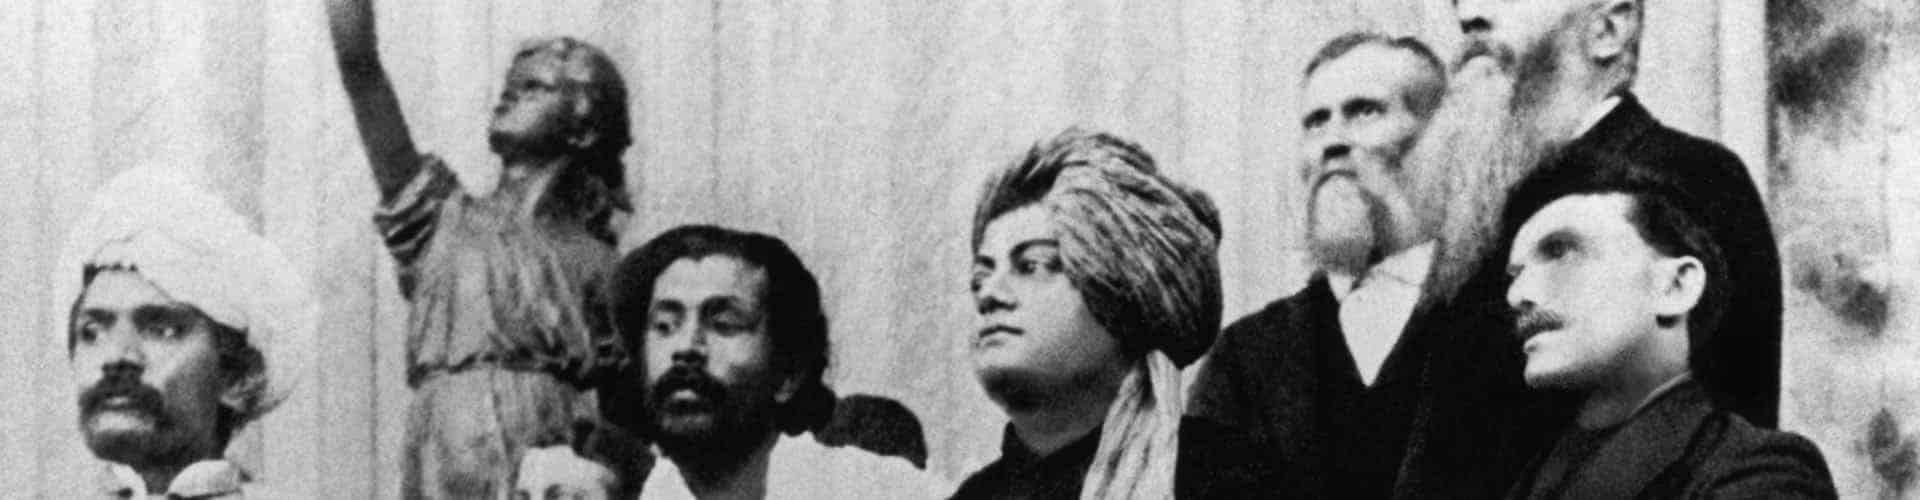 swami-vivekananda-header